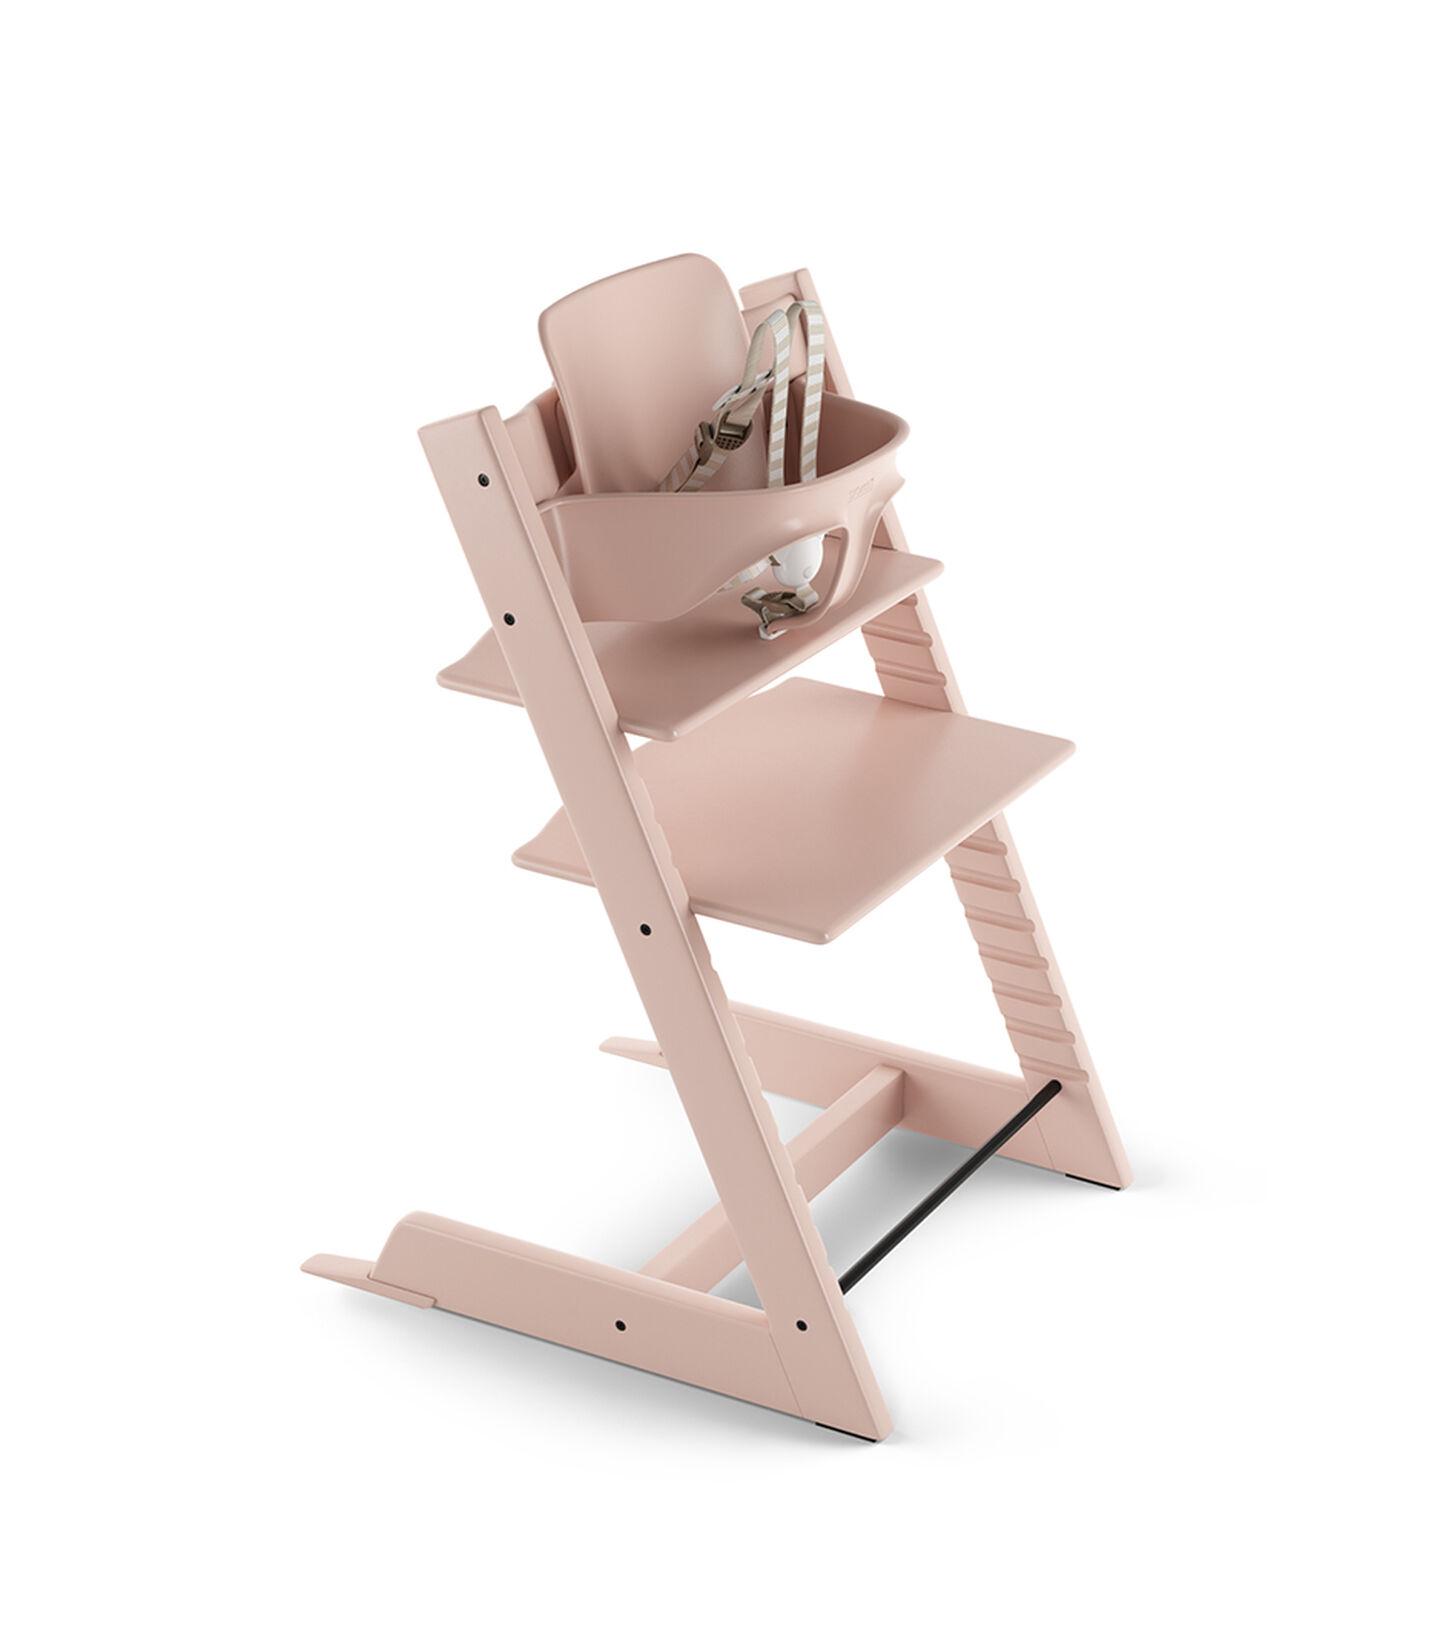 Tripp Trapp® Baby Set Serene Pink US, Serene Pink, mainview view 2